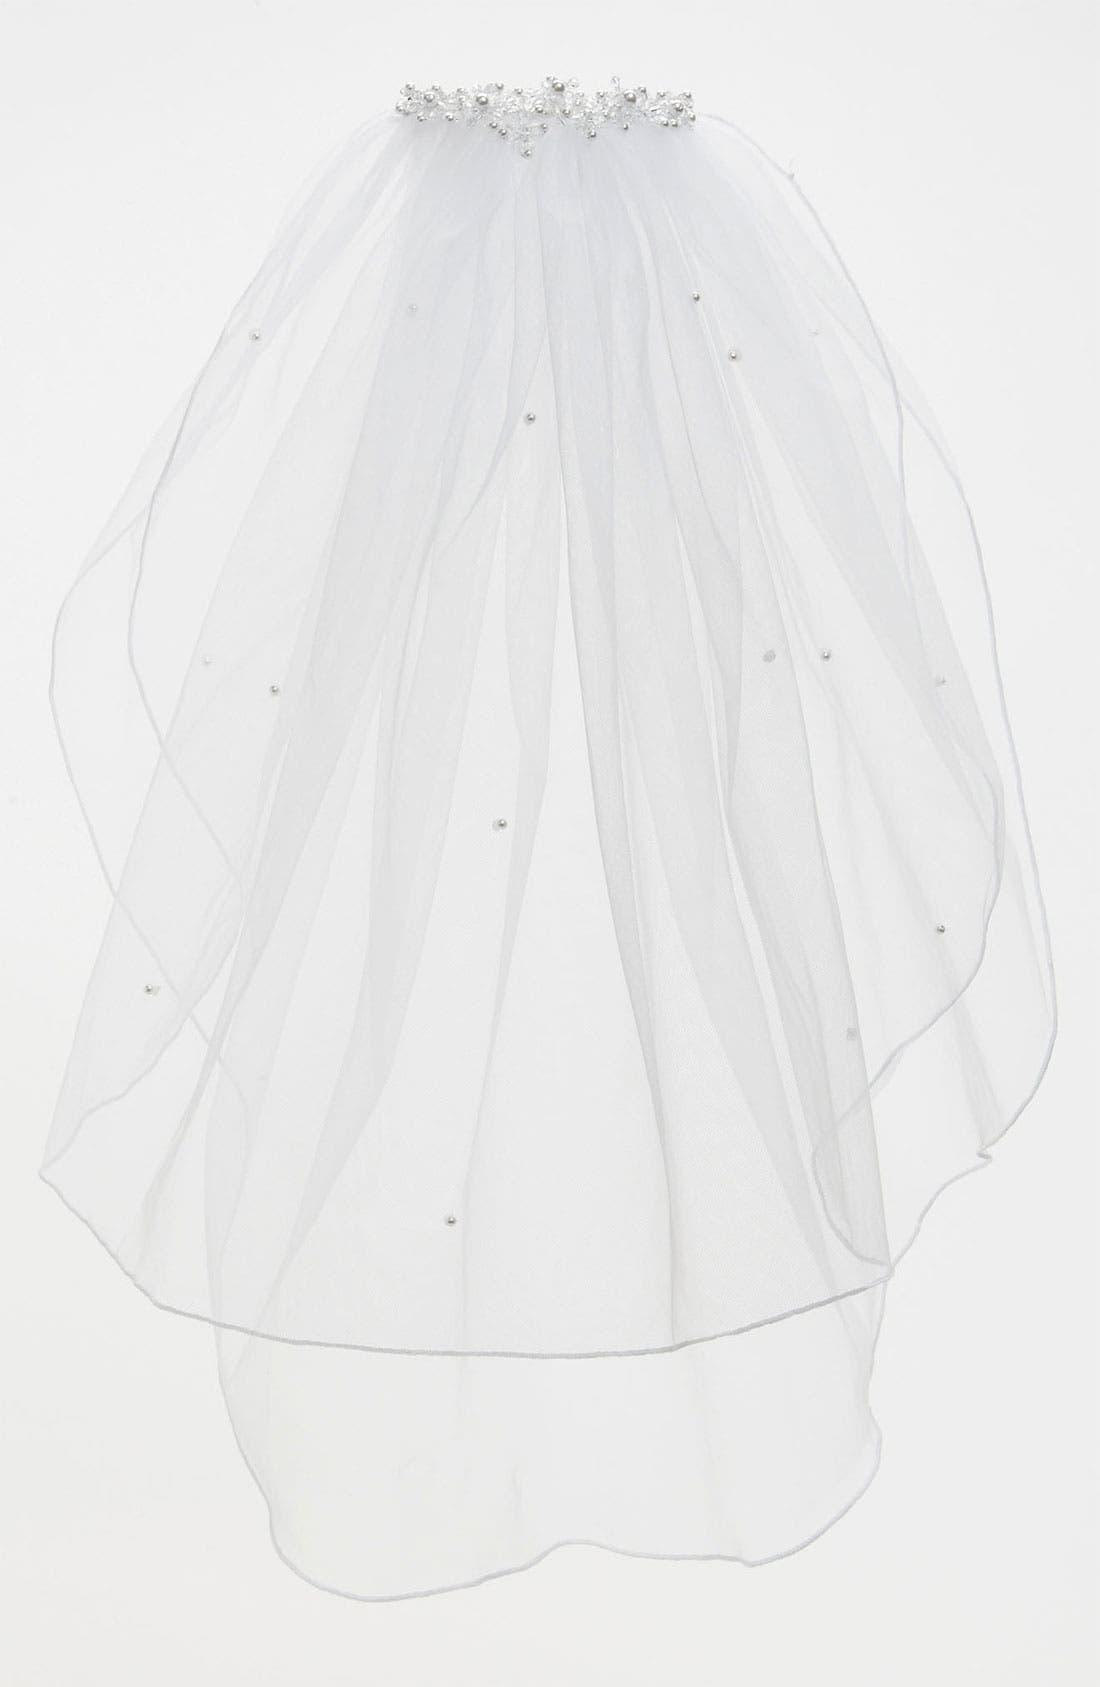 Beaded Crown & Veil,                             Main thumbnail 1, color,                             WHITE